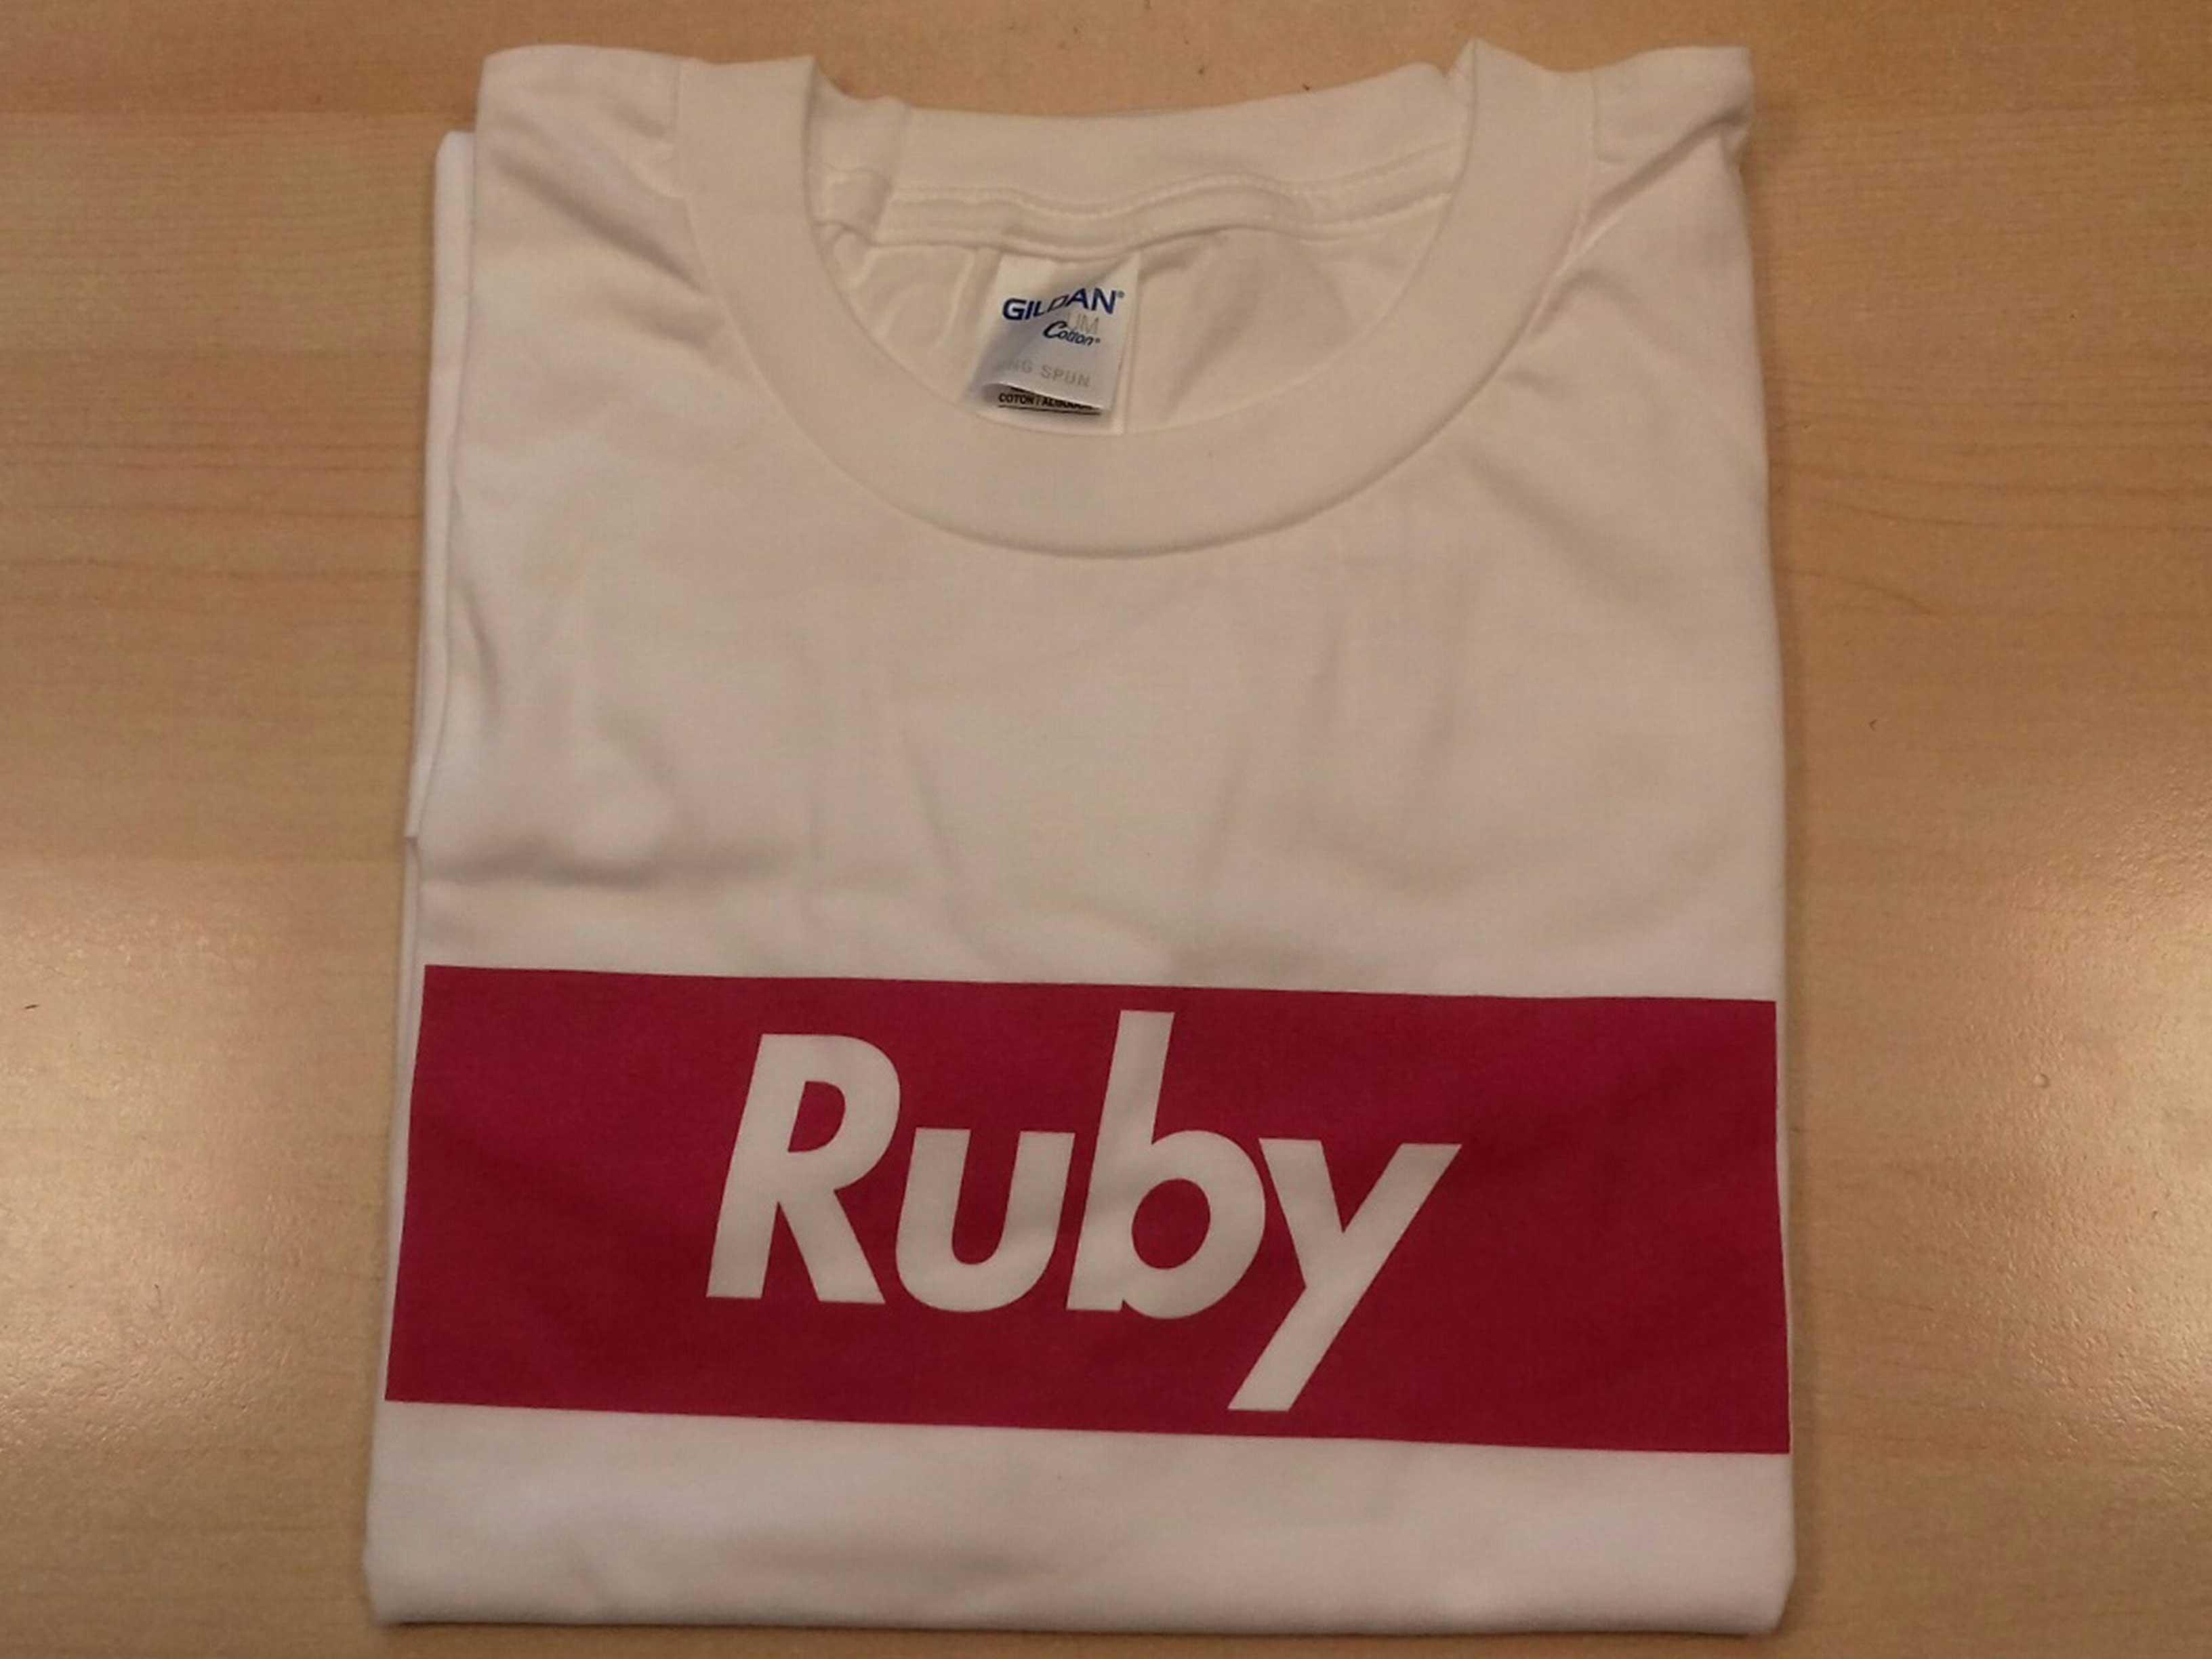 Tshirt printing in London,T Shirt Printing